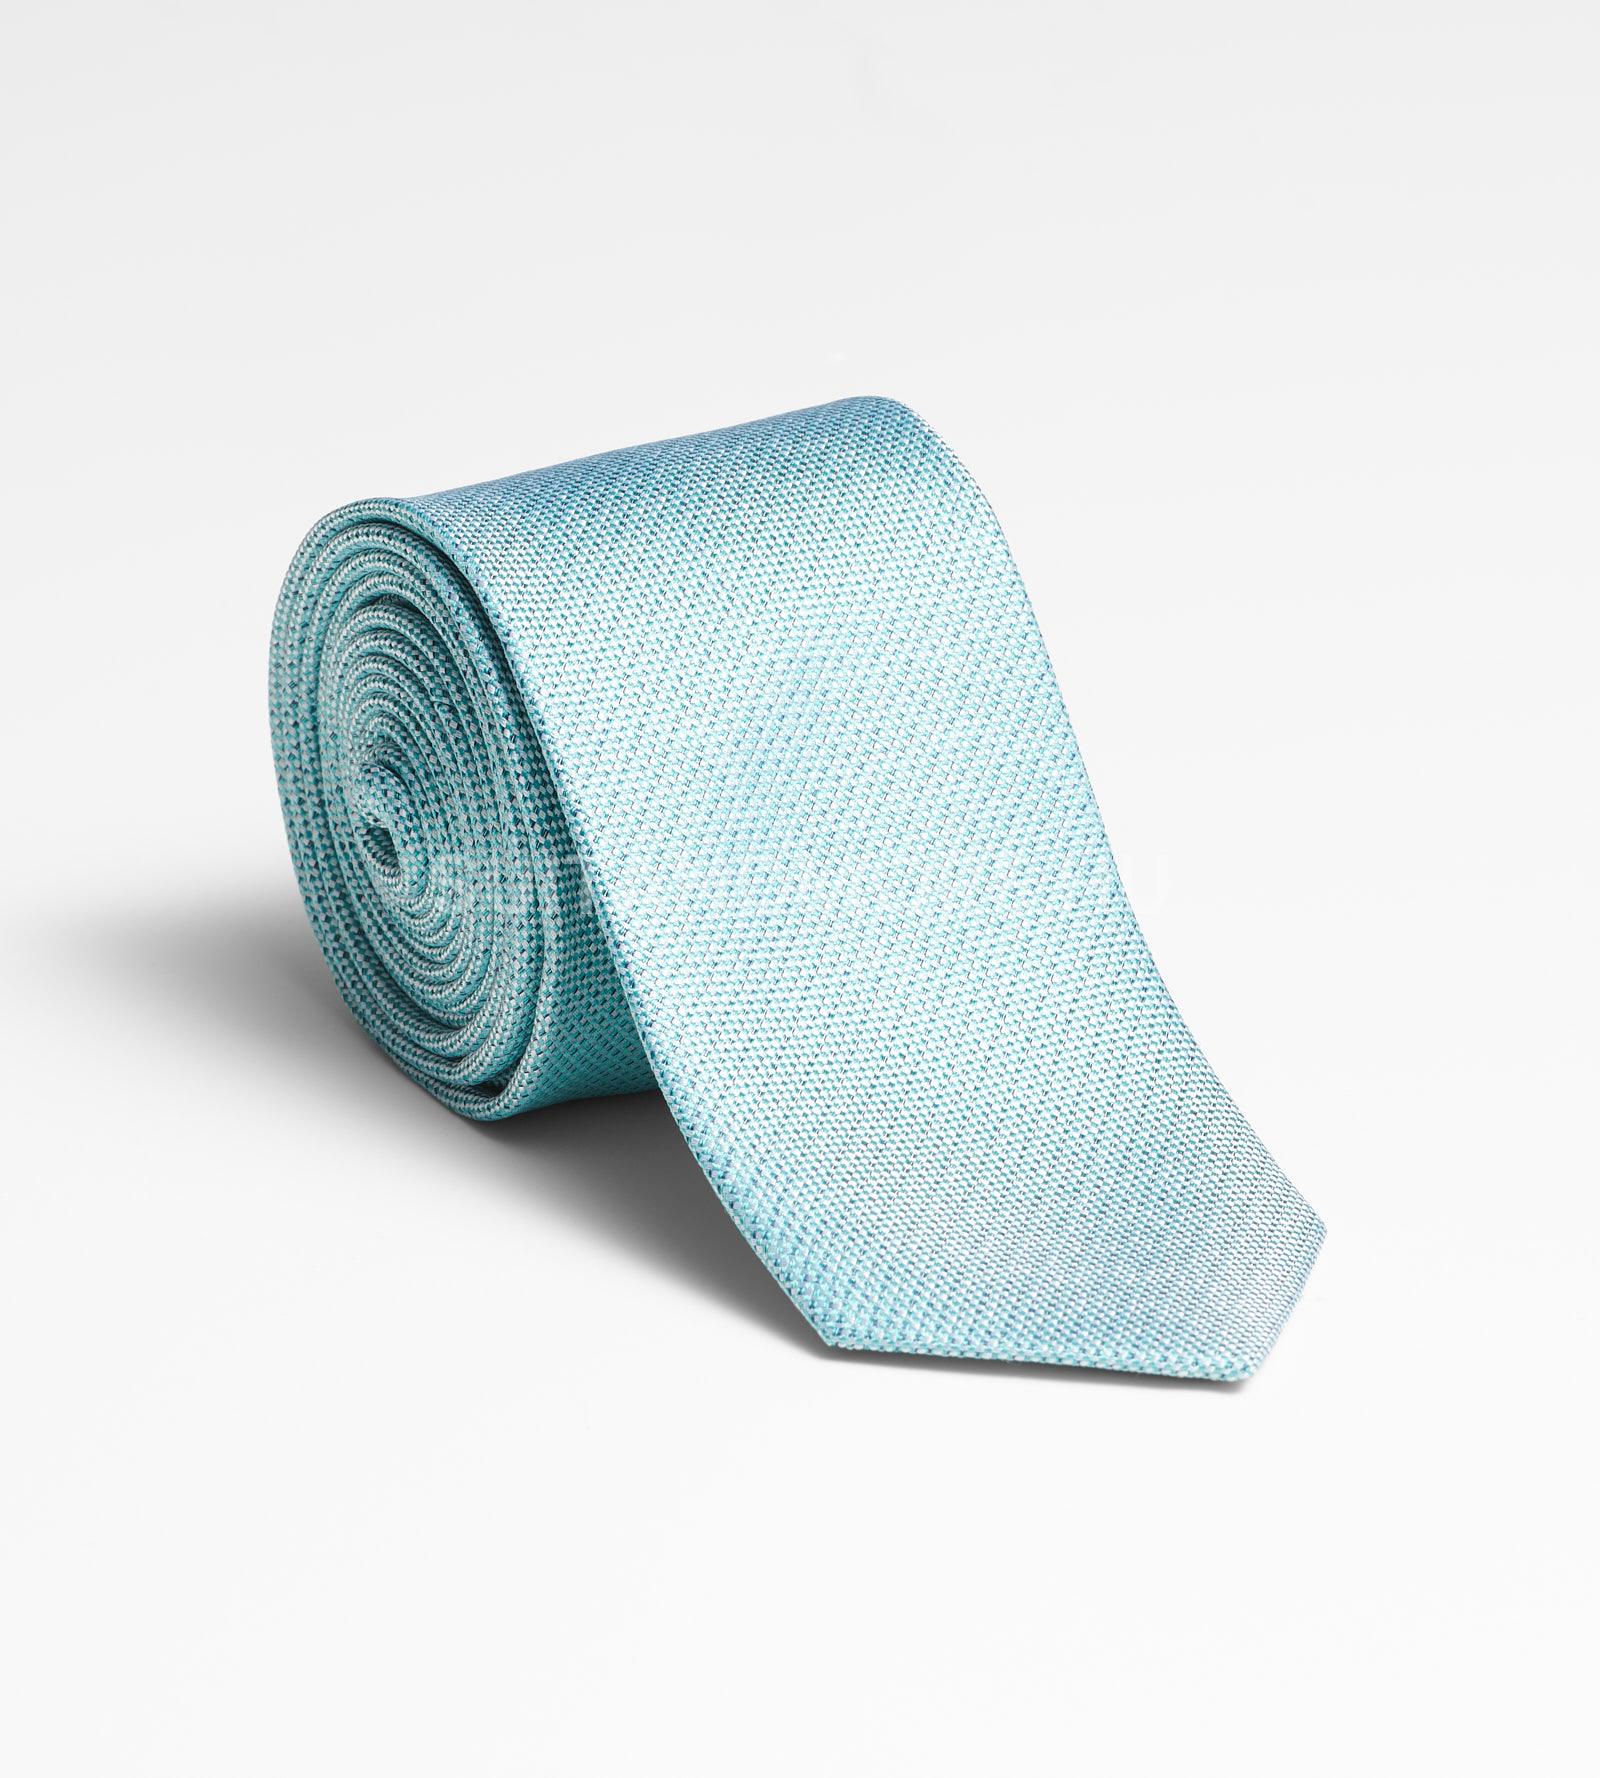 digel-turkizkek-apromintas-selyem-nyakkendo-dunhill-1199001-54-01